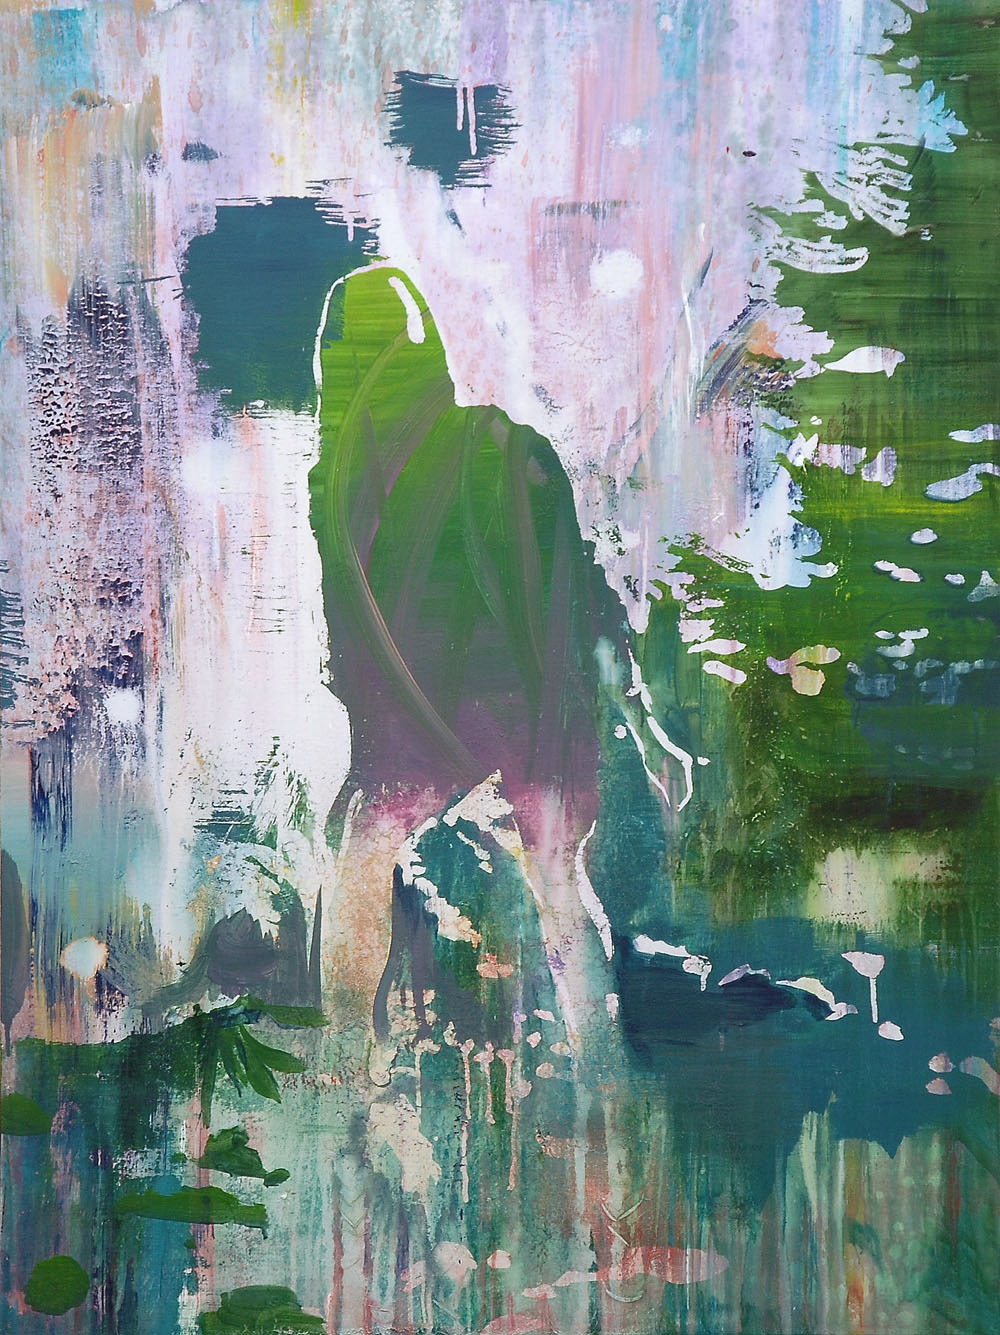 Lu Song 吕松, Girl in Jungle 丛林中的女孩, 2015, Oil on canvas 布面油画, 120 x 90 cm